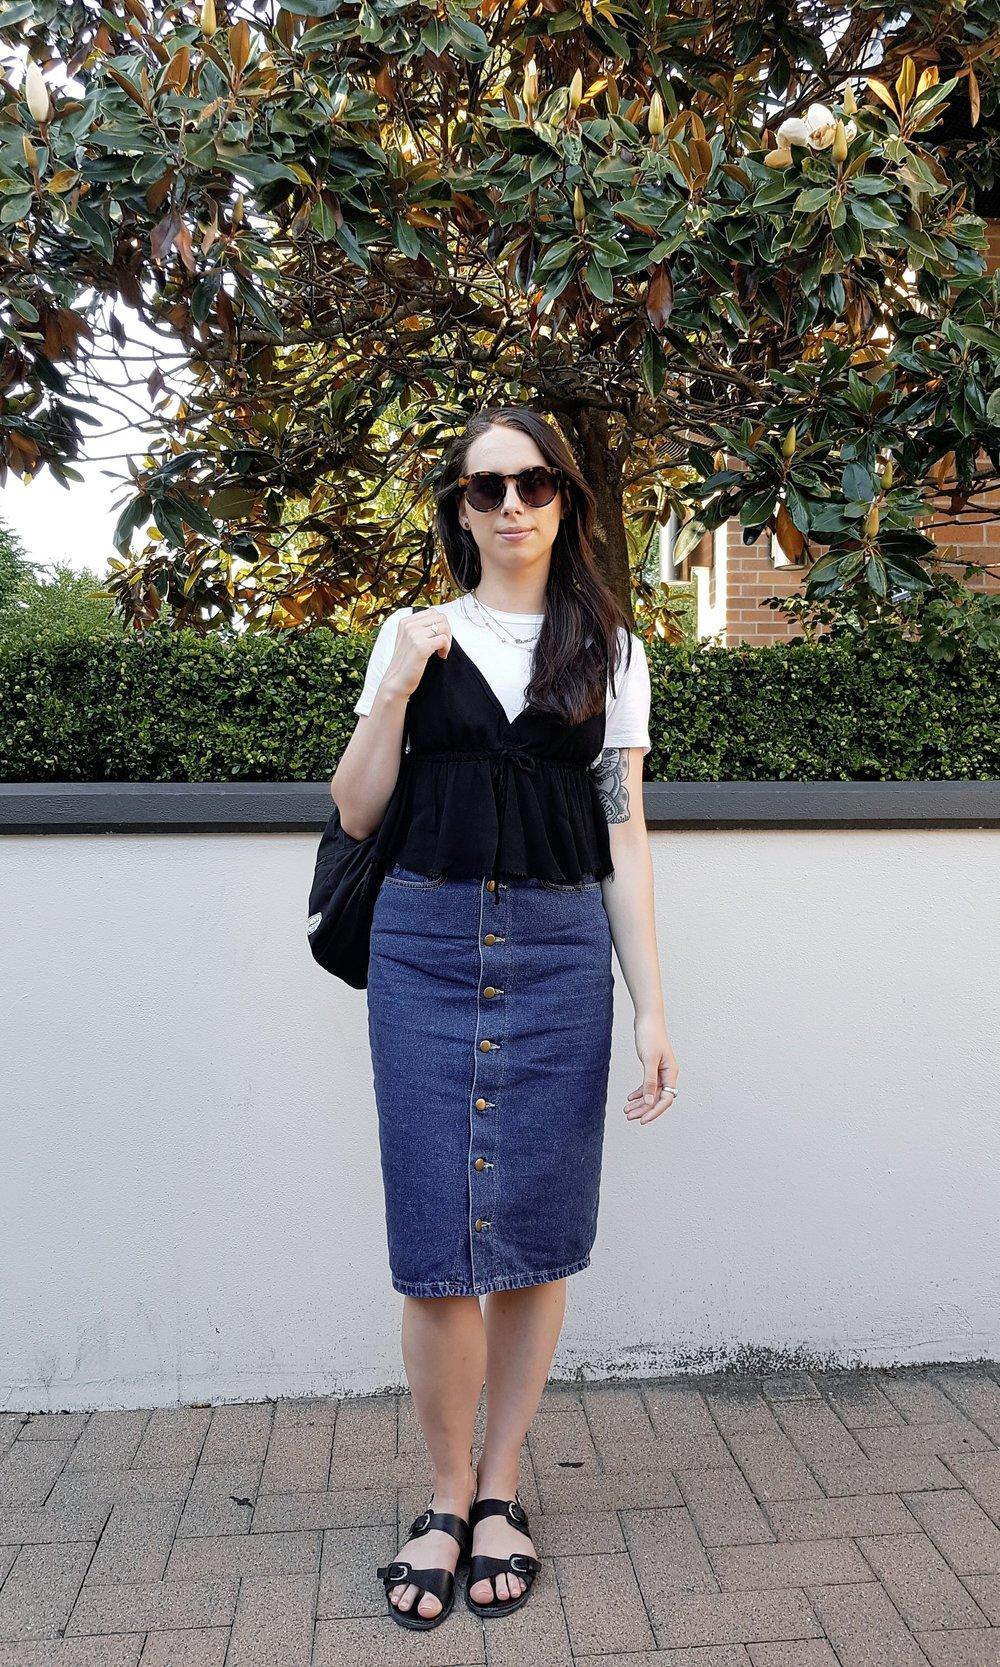 MONDAY - Zara tee, Brandy Melville cami, American Apparel skirt, Forever 21 sandals, Oak+Fort sunnies